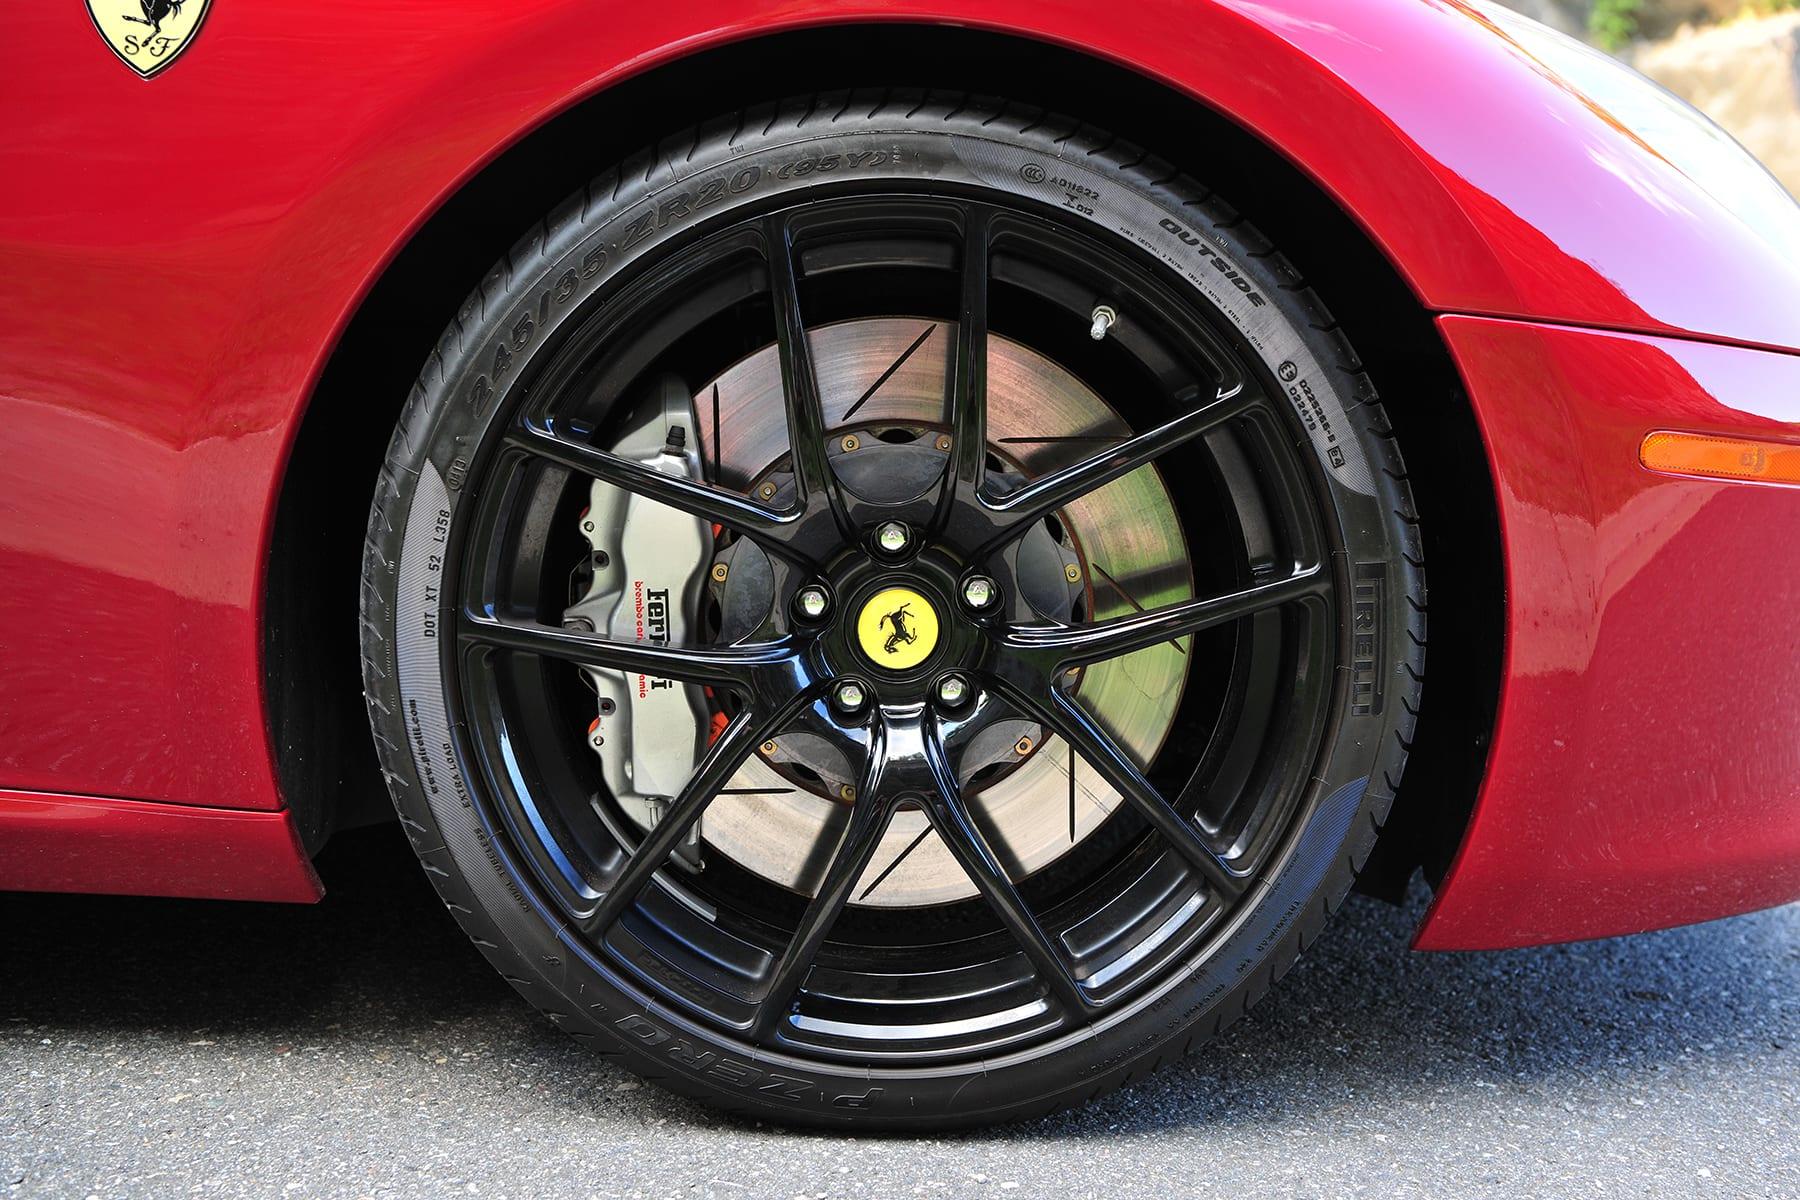 2008 Ferrari 599 GTB Fiorano HGTE #159219